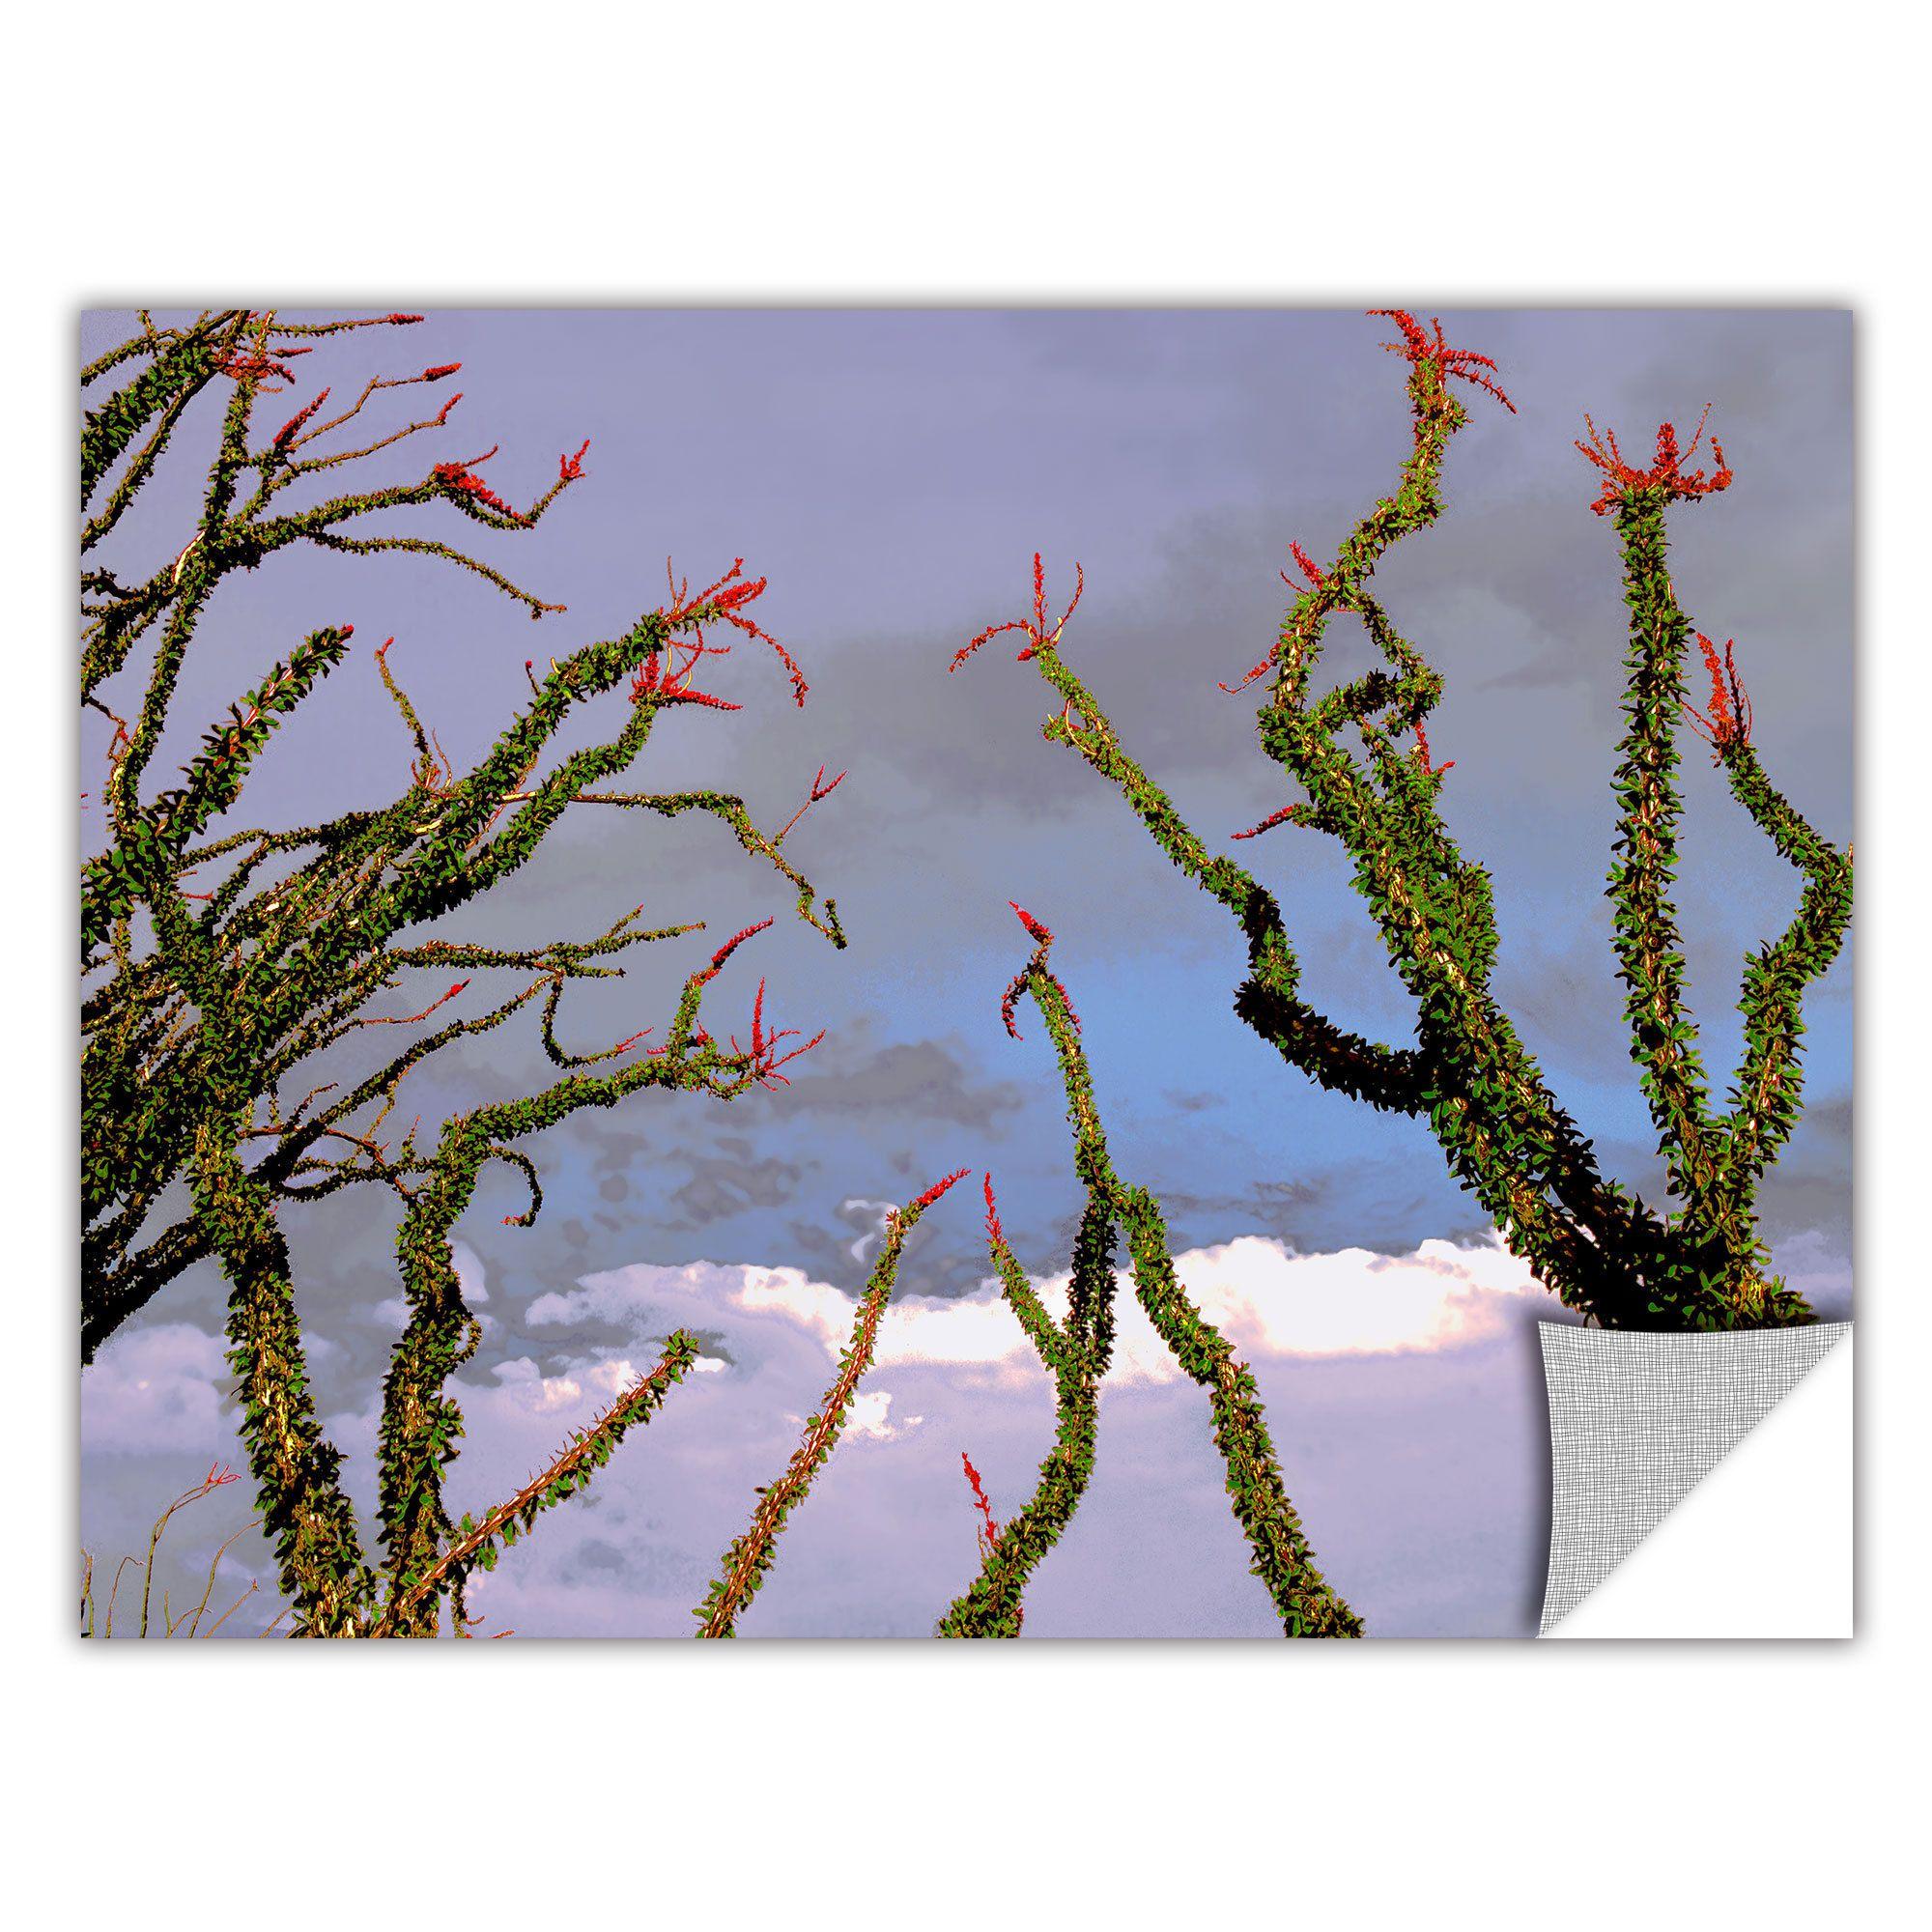 Removable wall art graphic - Artwall Dean Uhlinger Yuma Desert Spring Art Appeelz Removable Wall Art Graphic